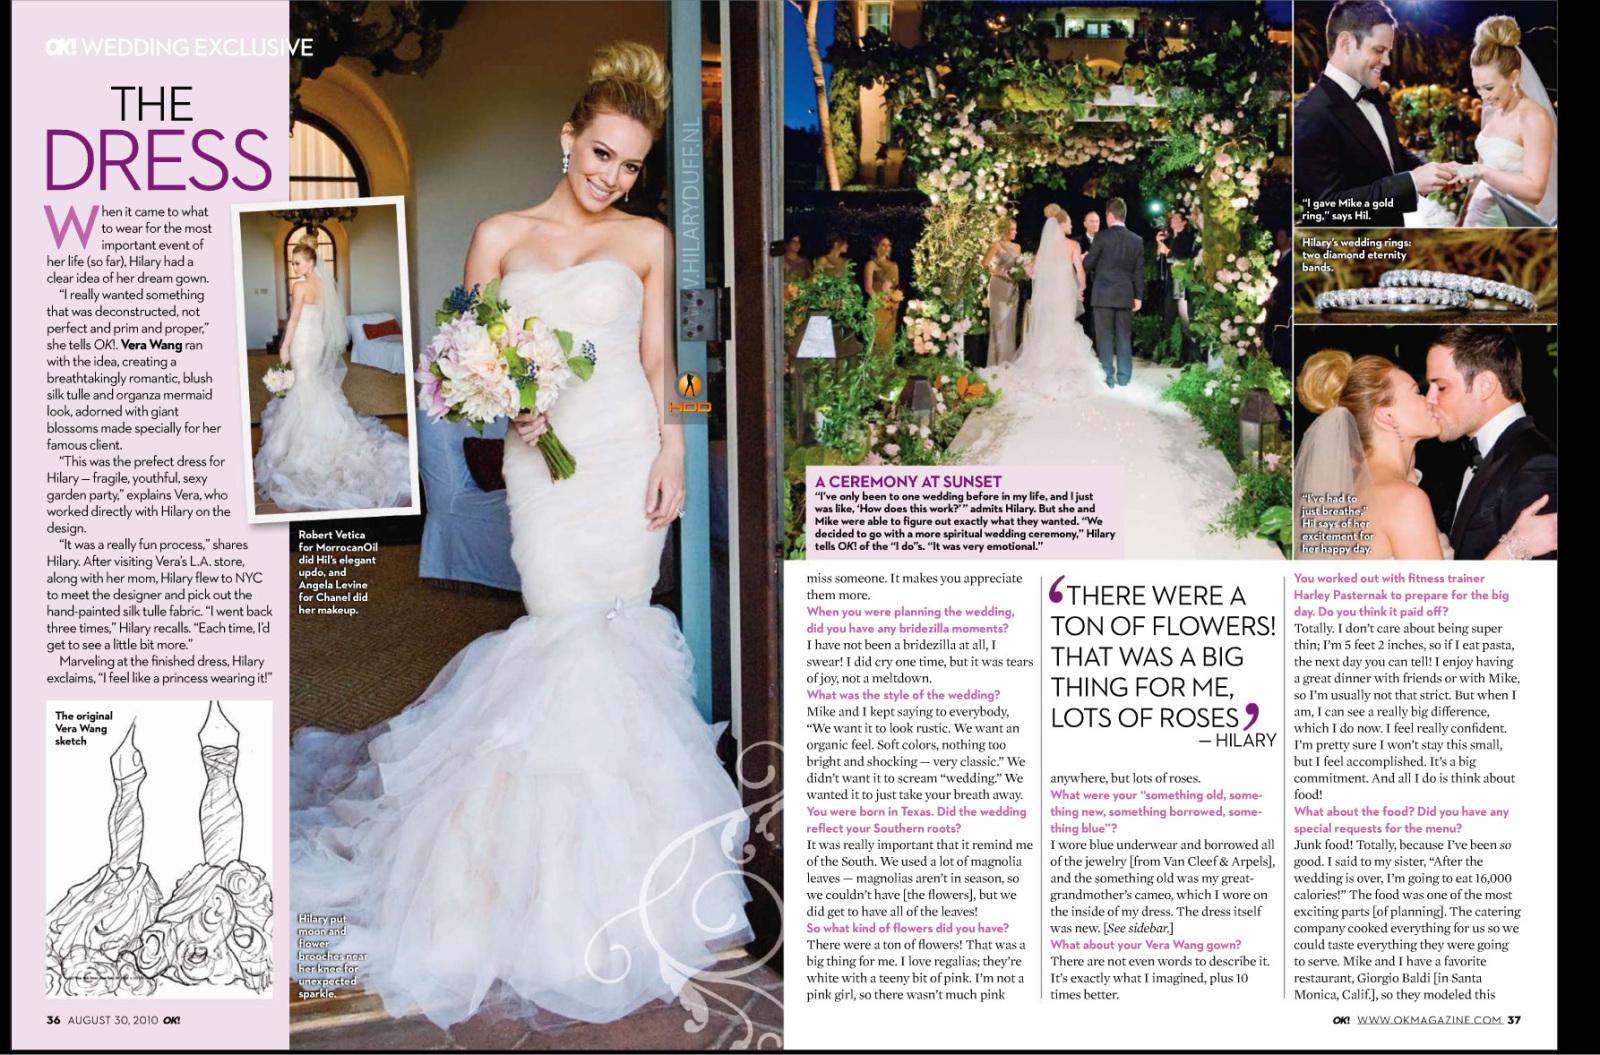 hilary-duff-wedding-snaps-pics-in-ok-magazine-03 - GotCeleb